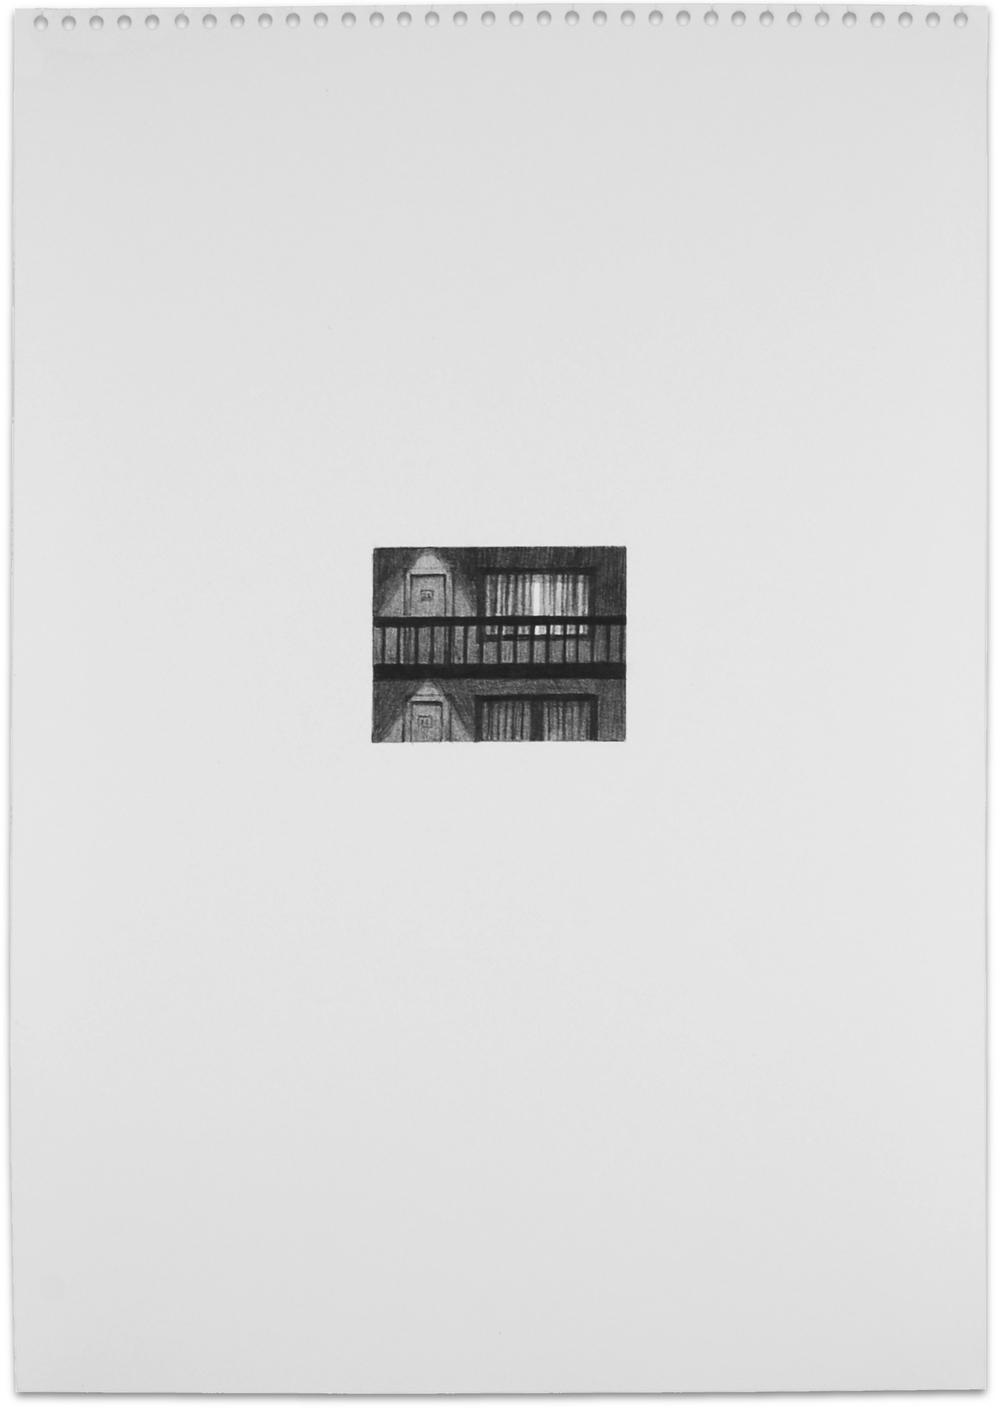 Secret (motel), 2013, 16.5 x 11.5, graphite on paper